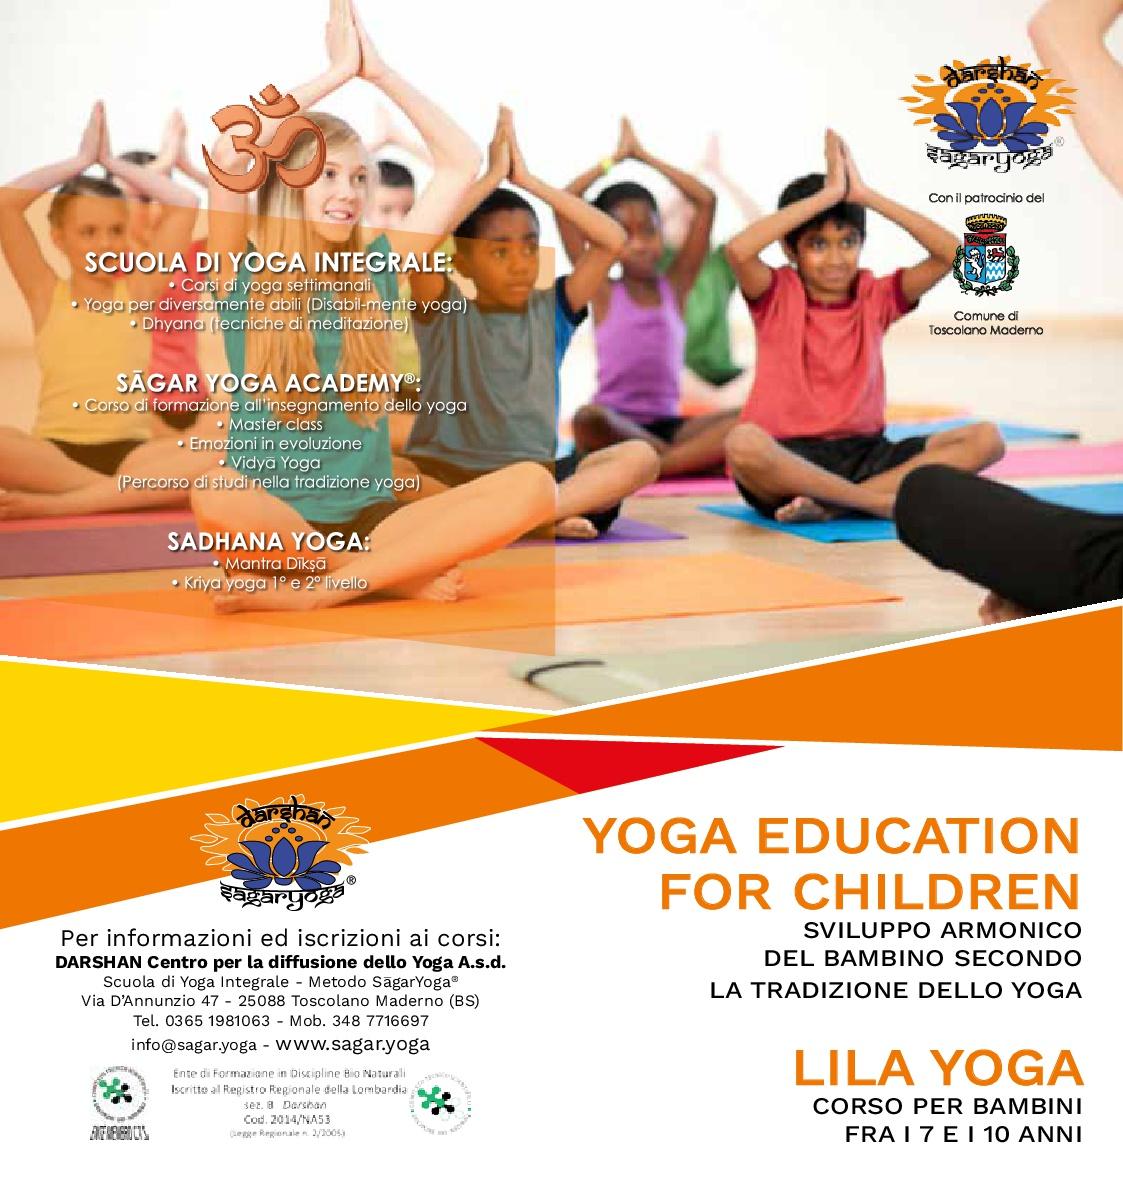 YOGA EDUCATION FOR CHILDREN - LILA YOGA